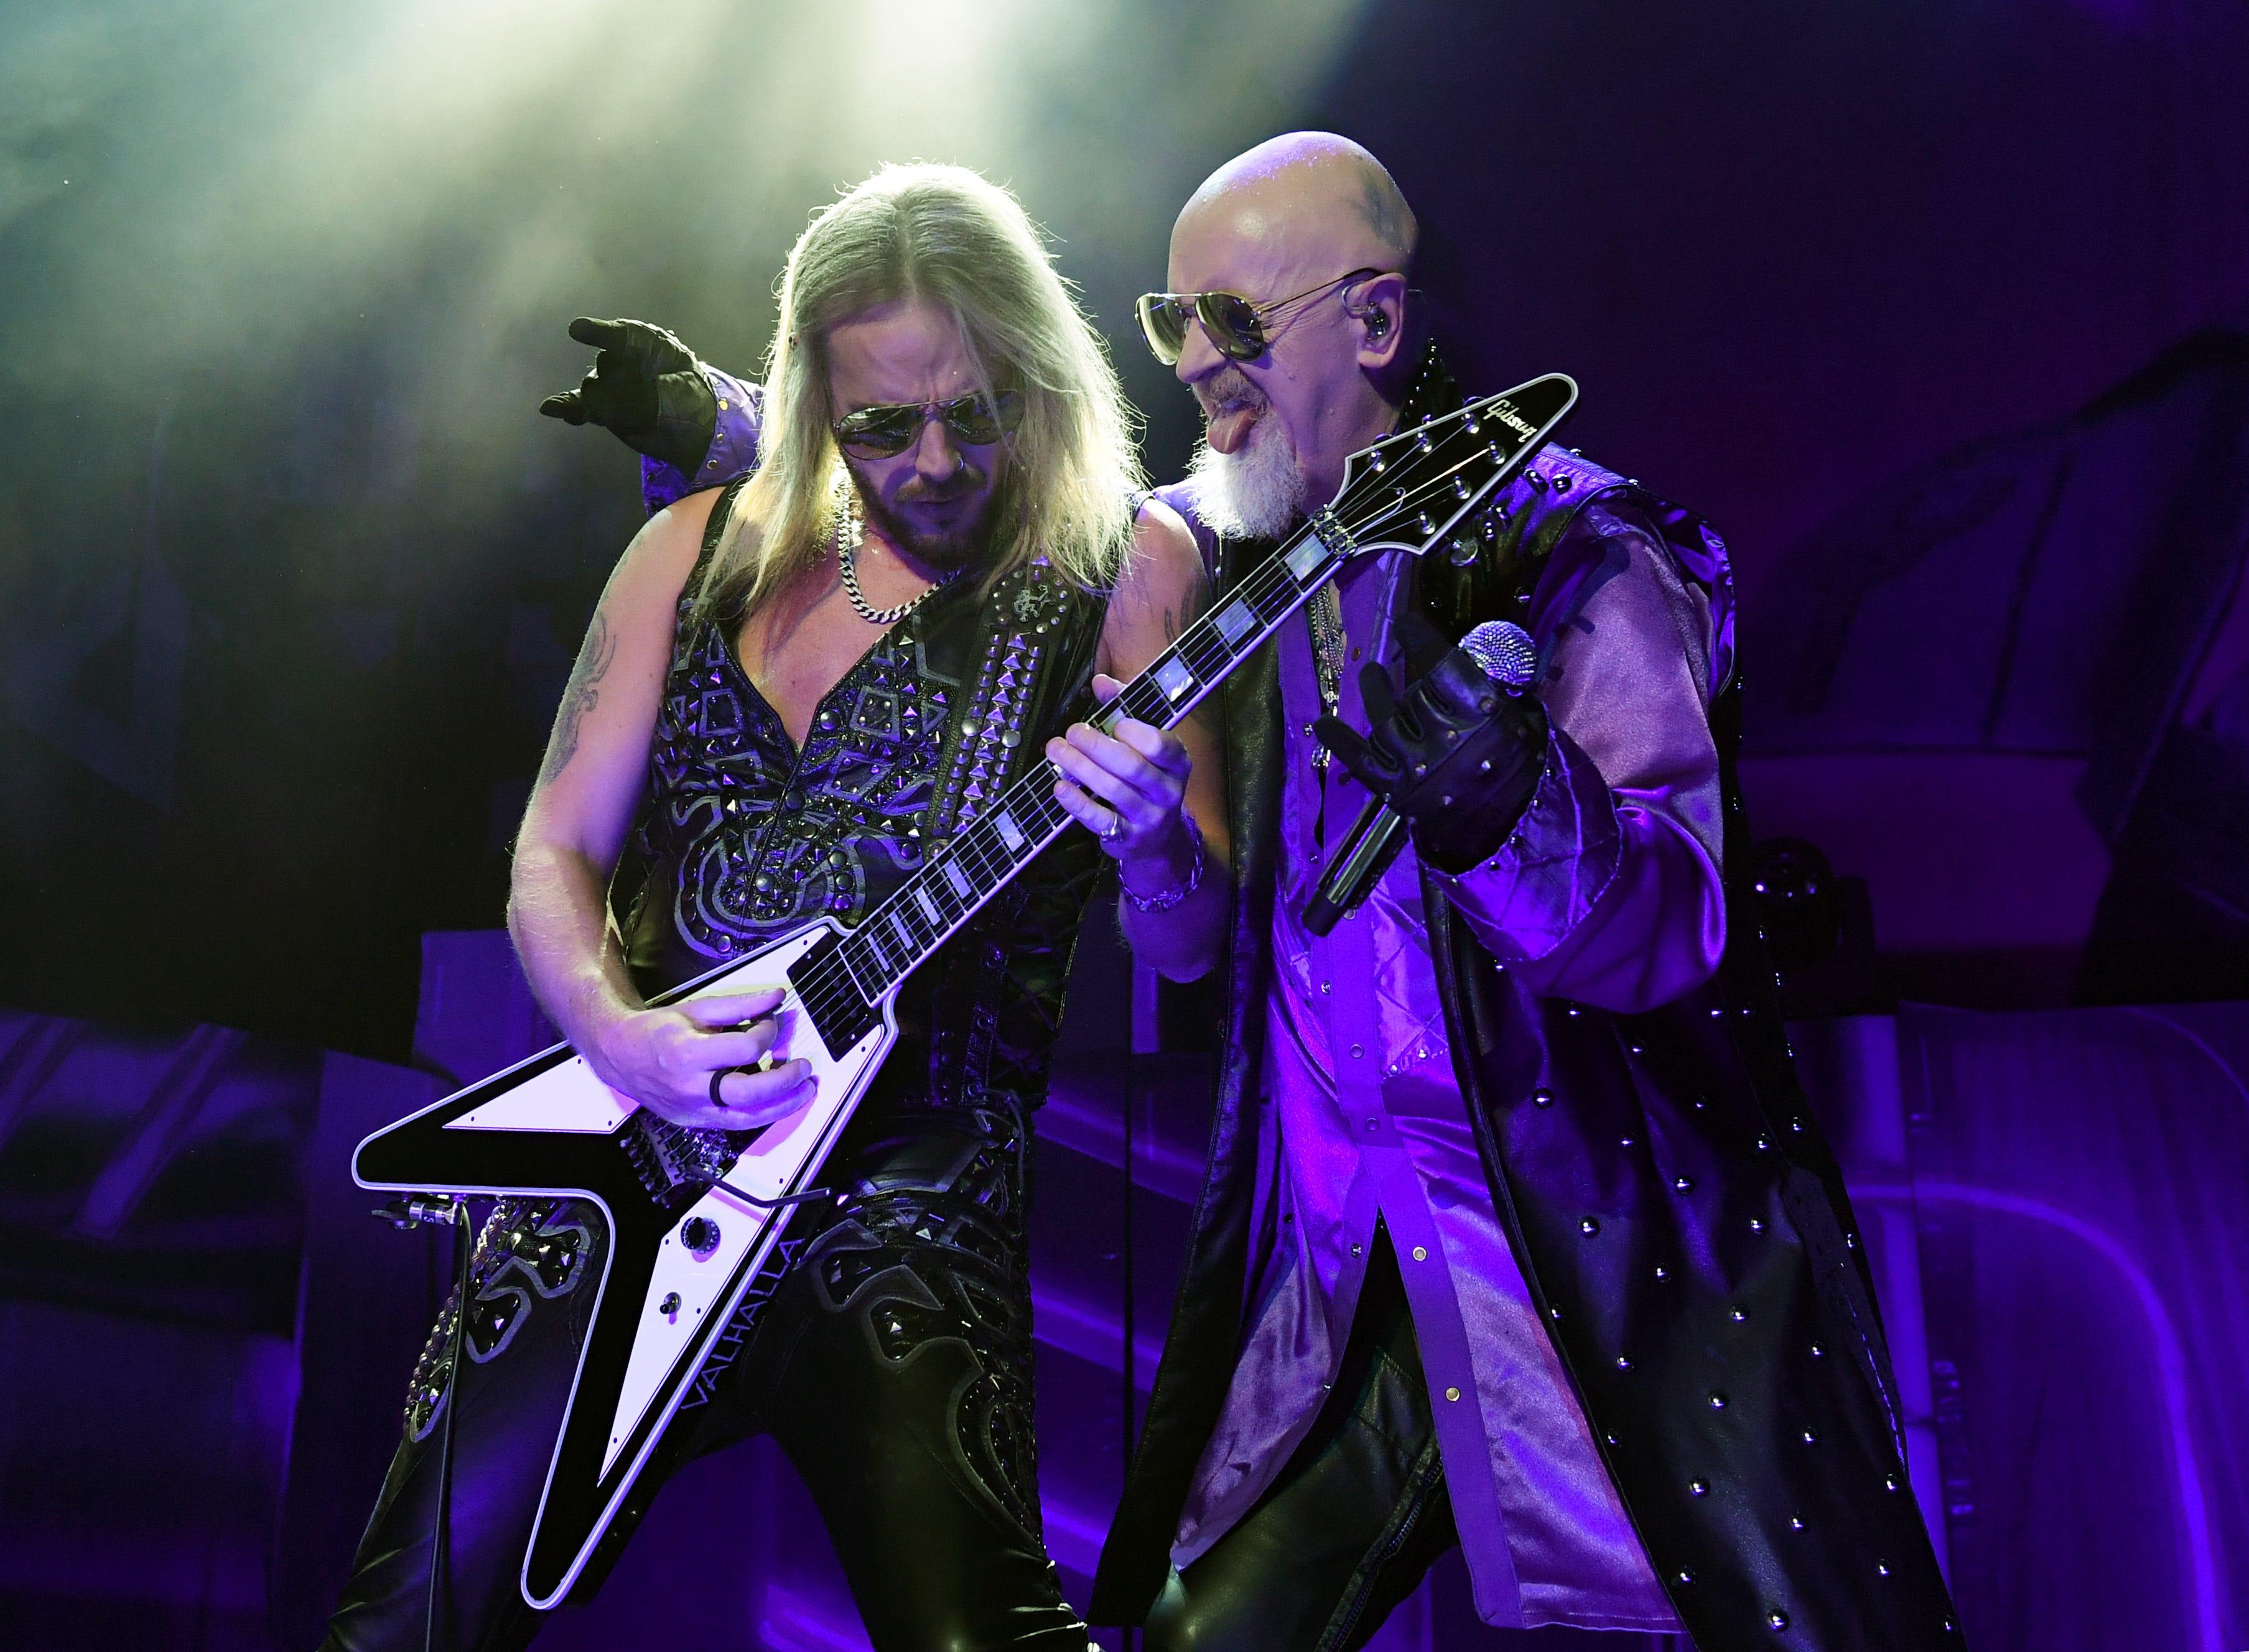 Judas Priest: Richie Faulkner hospitalized, tour postponed in the US